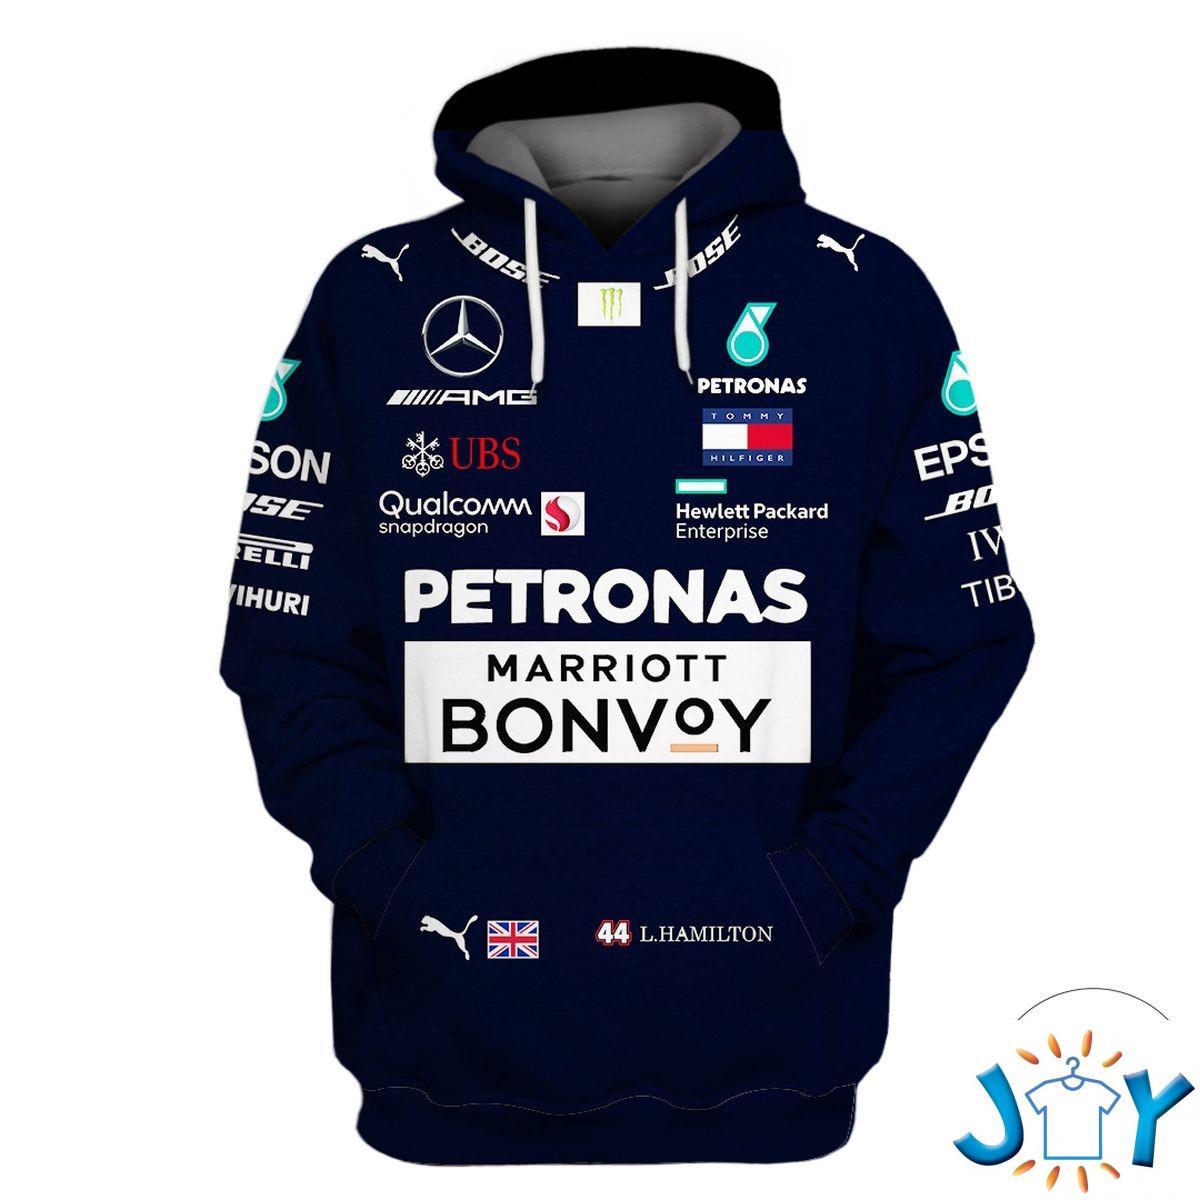 2018 Lewis Hamilton Mercedes F1 3D Hoodie